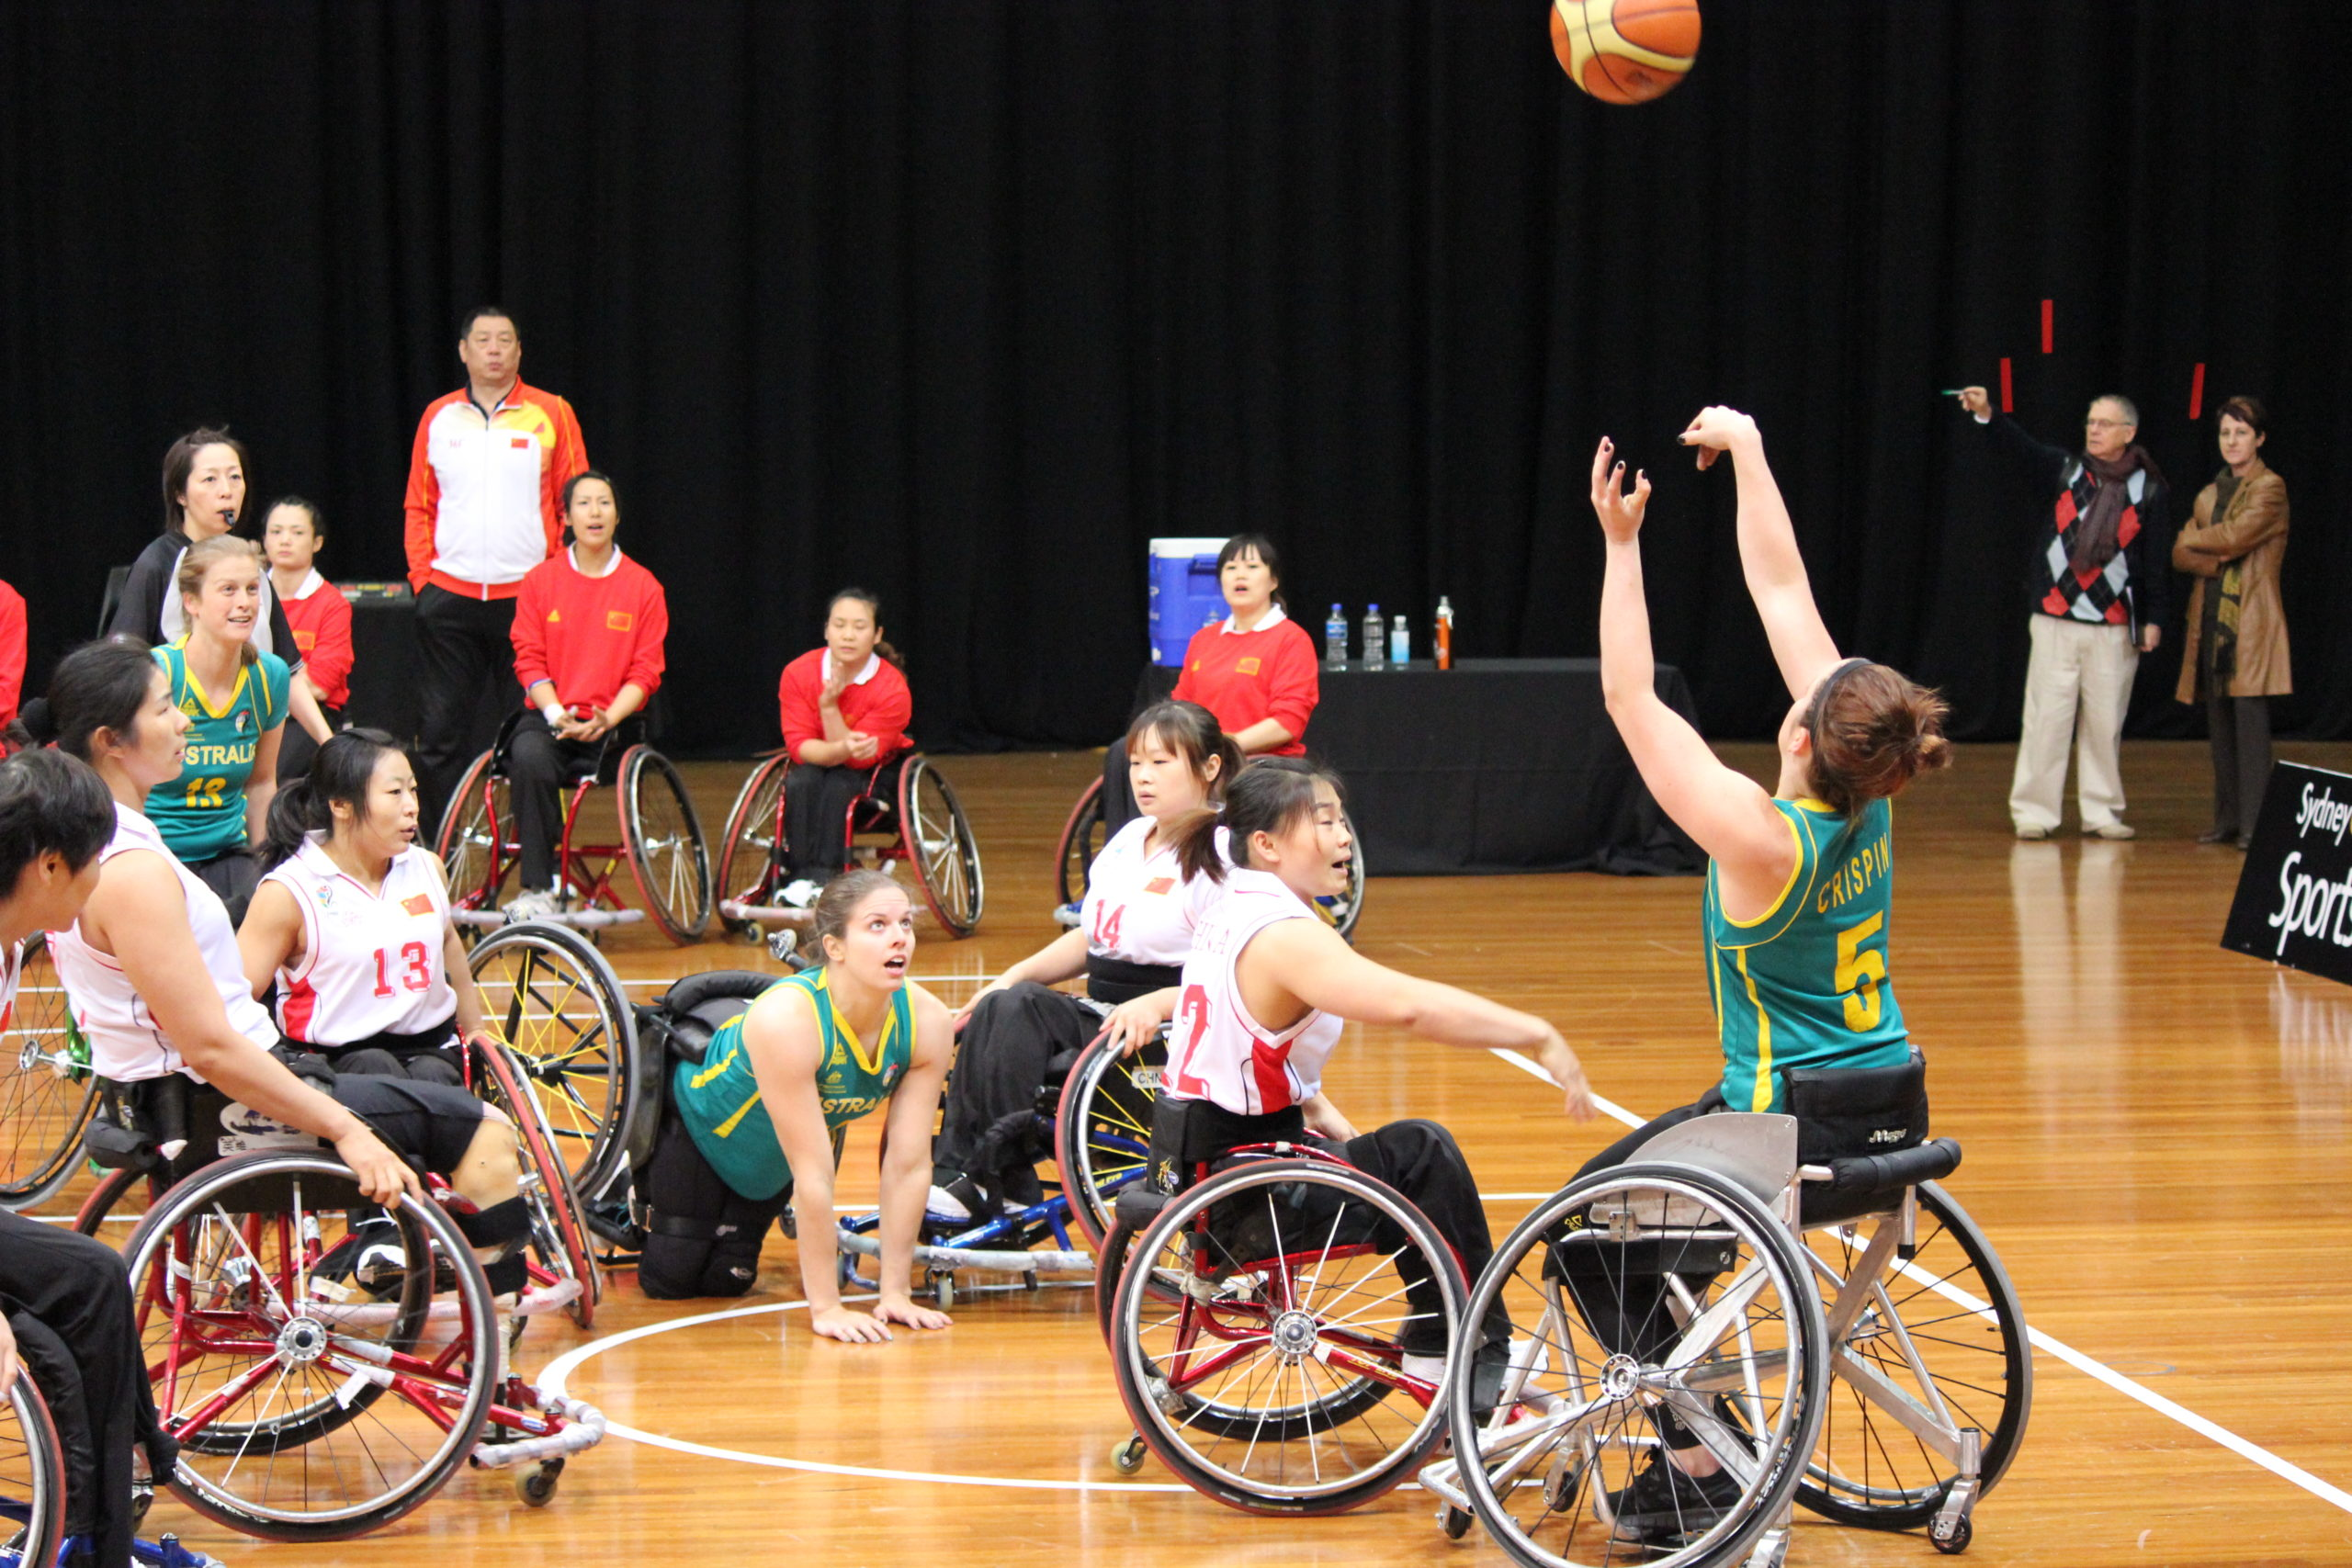 Australia women's national wheelchair basketball team versus China women's national wheelchair basketball team on 20 July 2012 at Sydney Olympic Park.